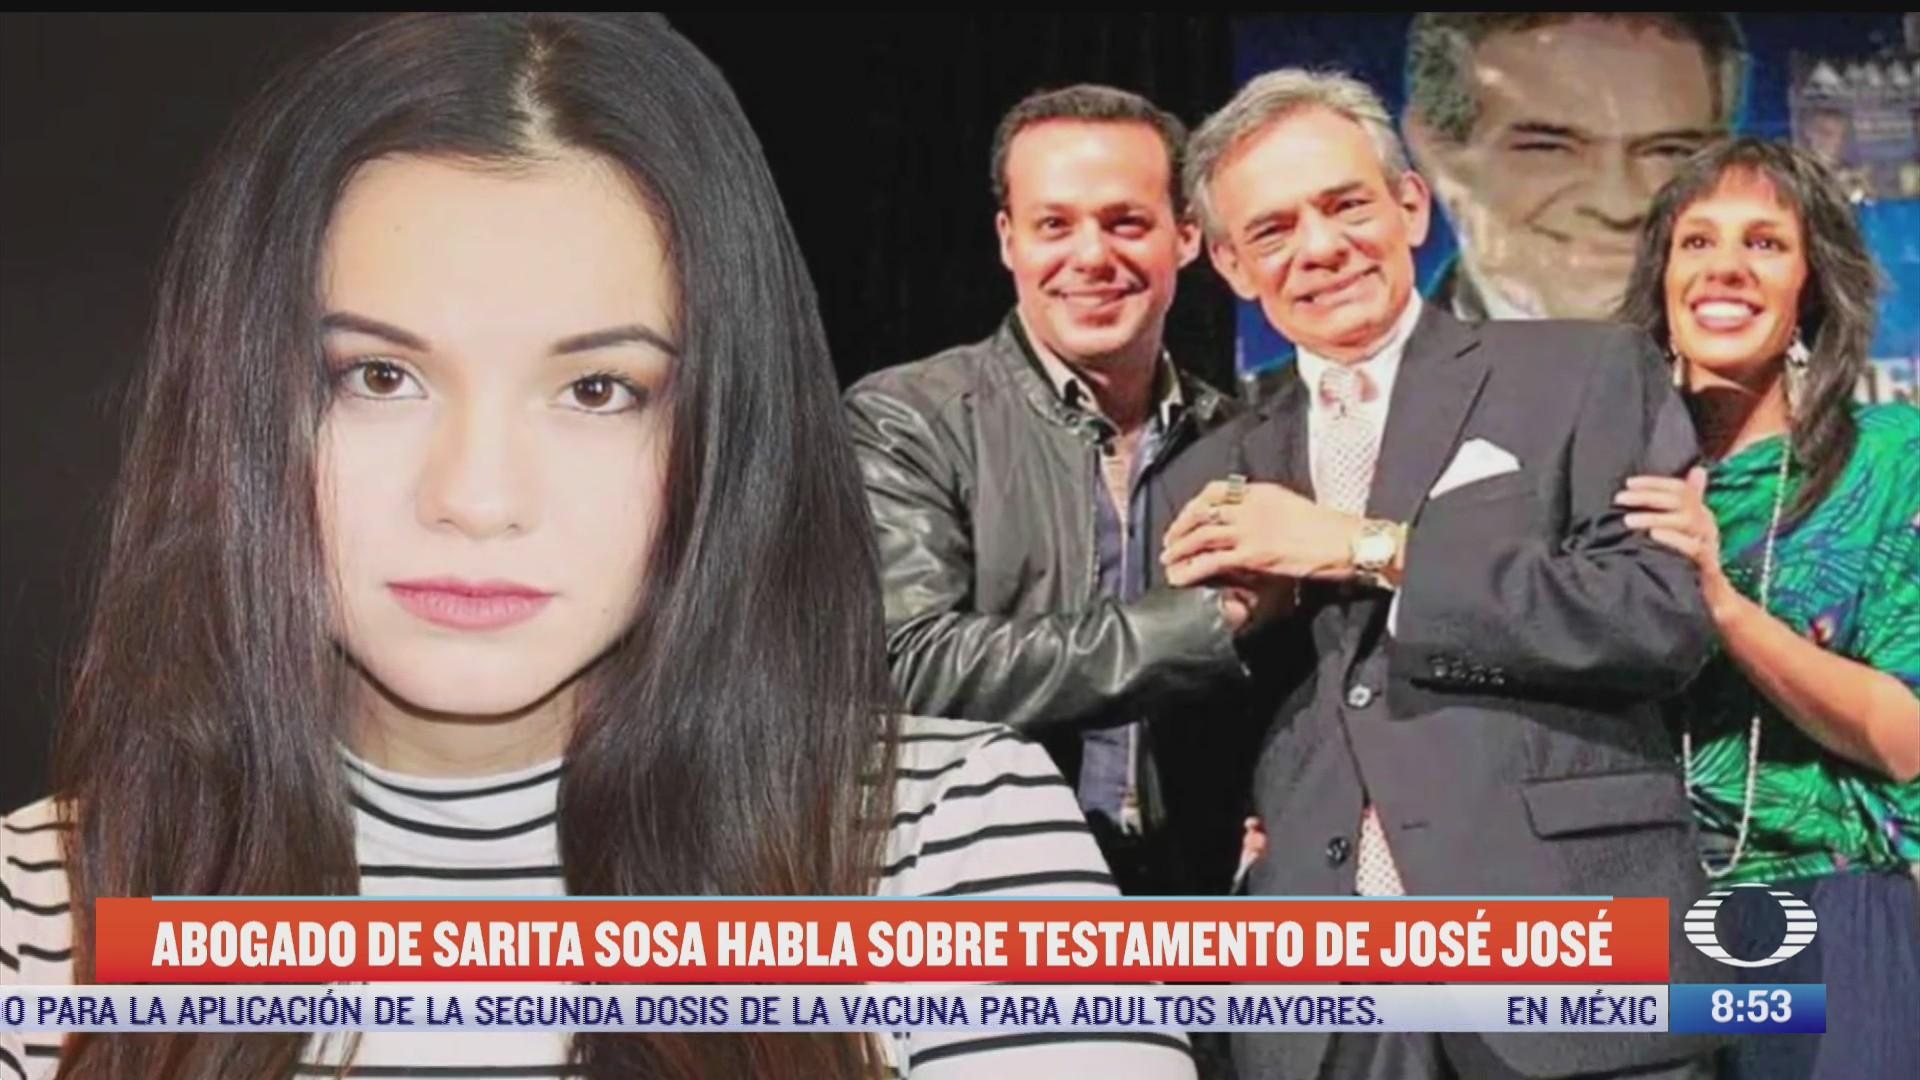 abogado de sarita sosa habla sobre testamento de jose jose